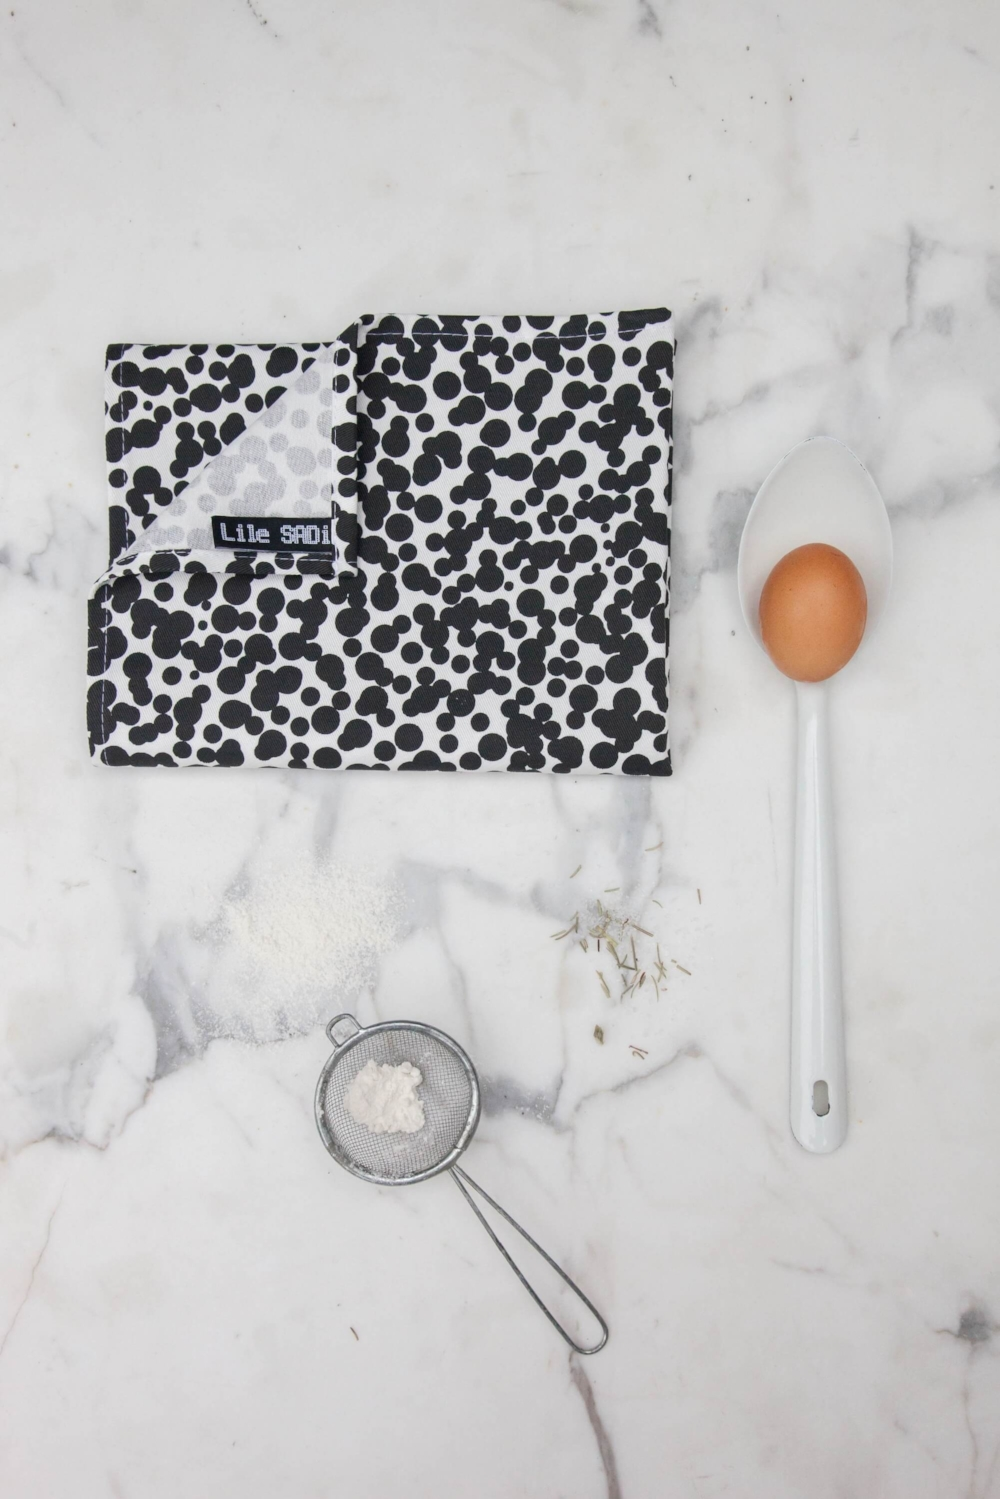 Tea-Towel-Dots-black-2000px-2000x3000.jpg